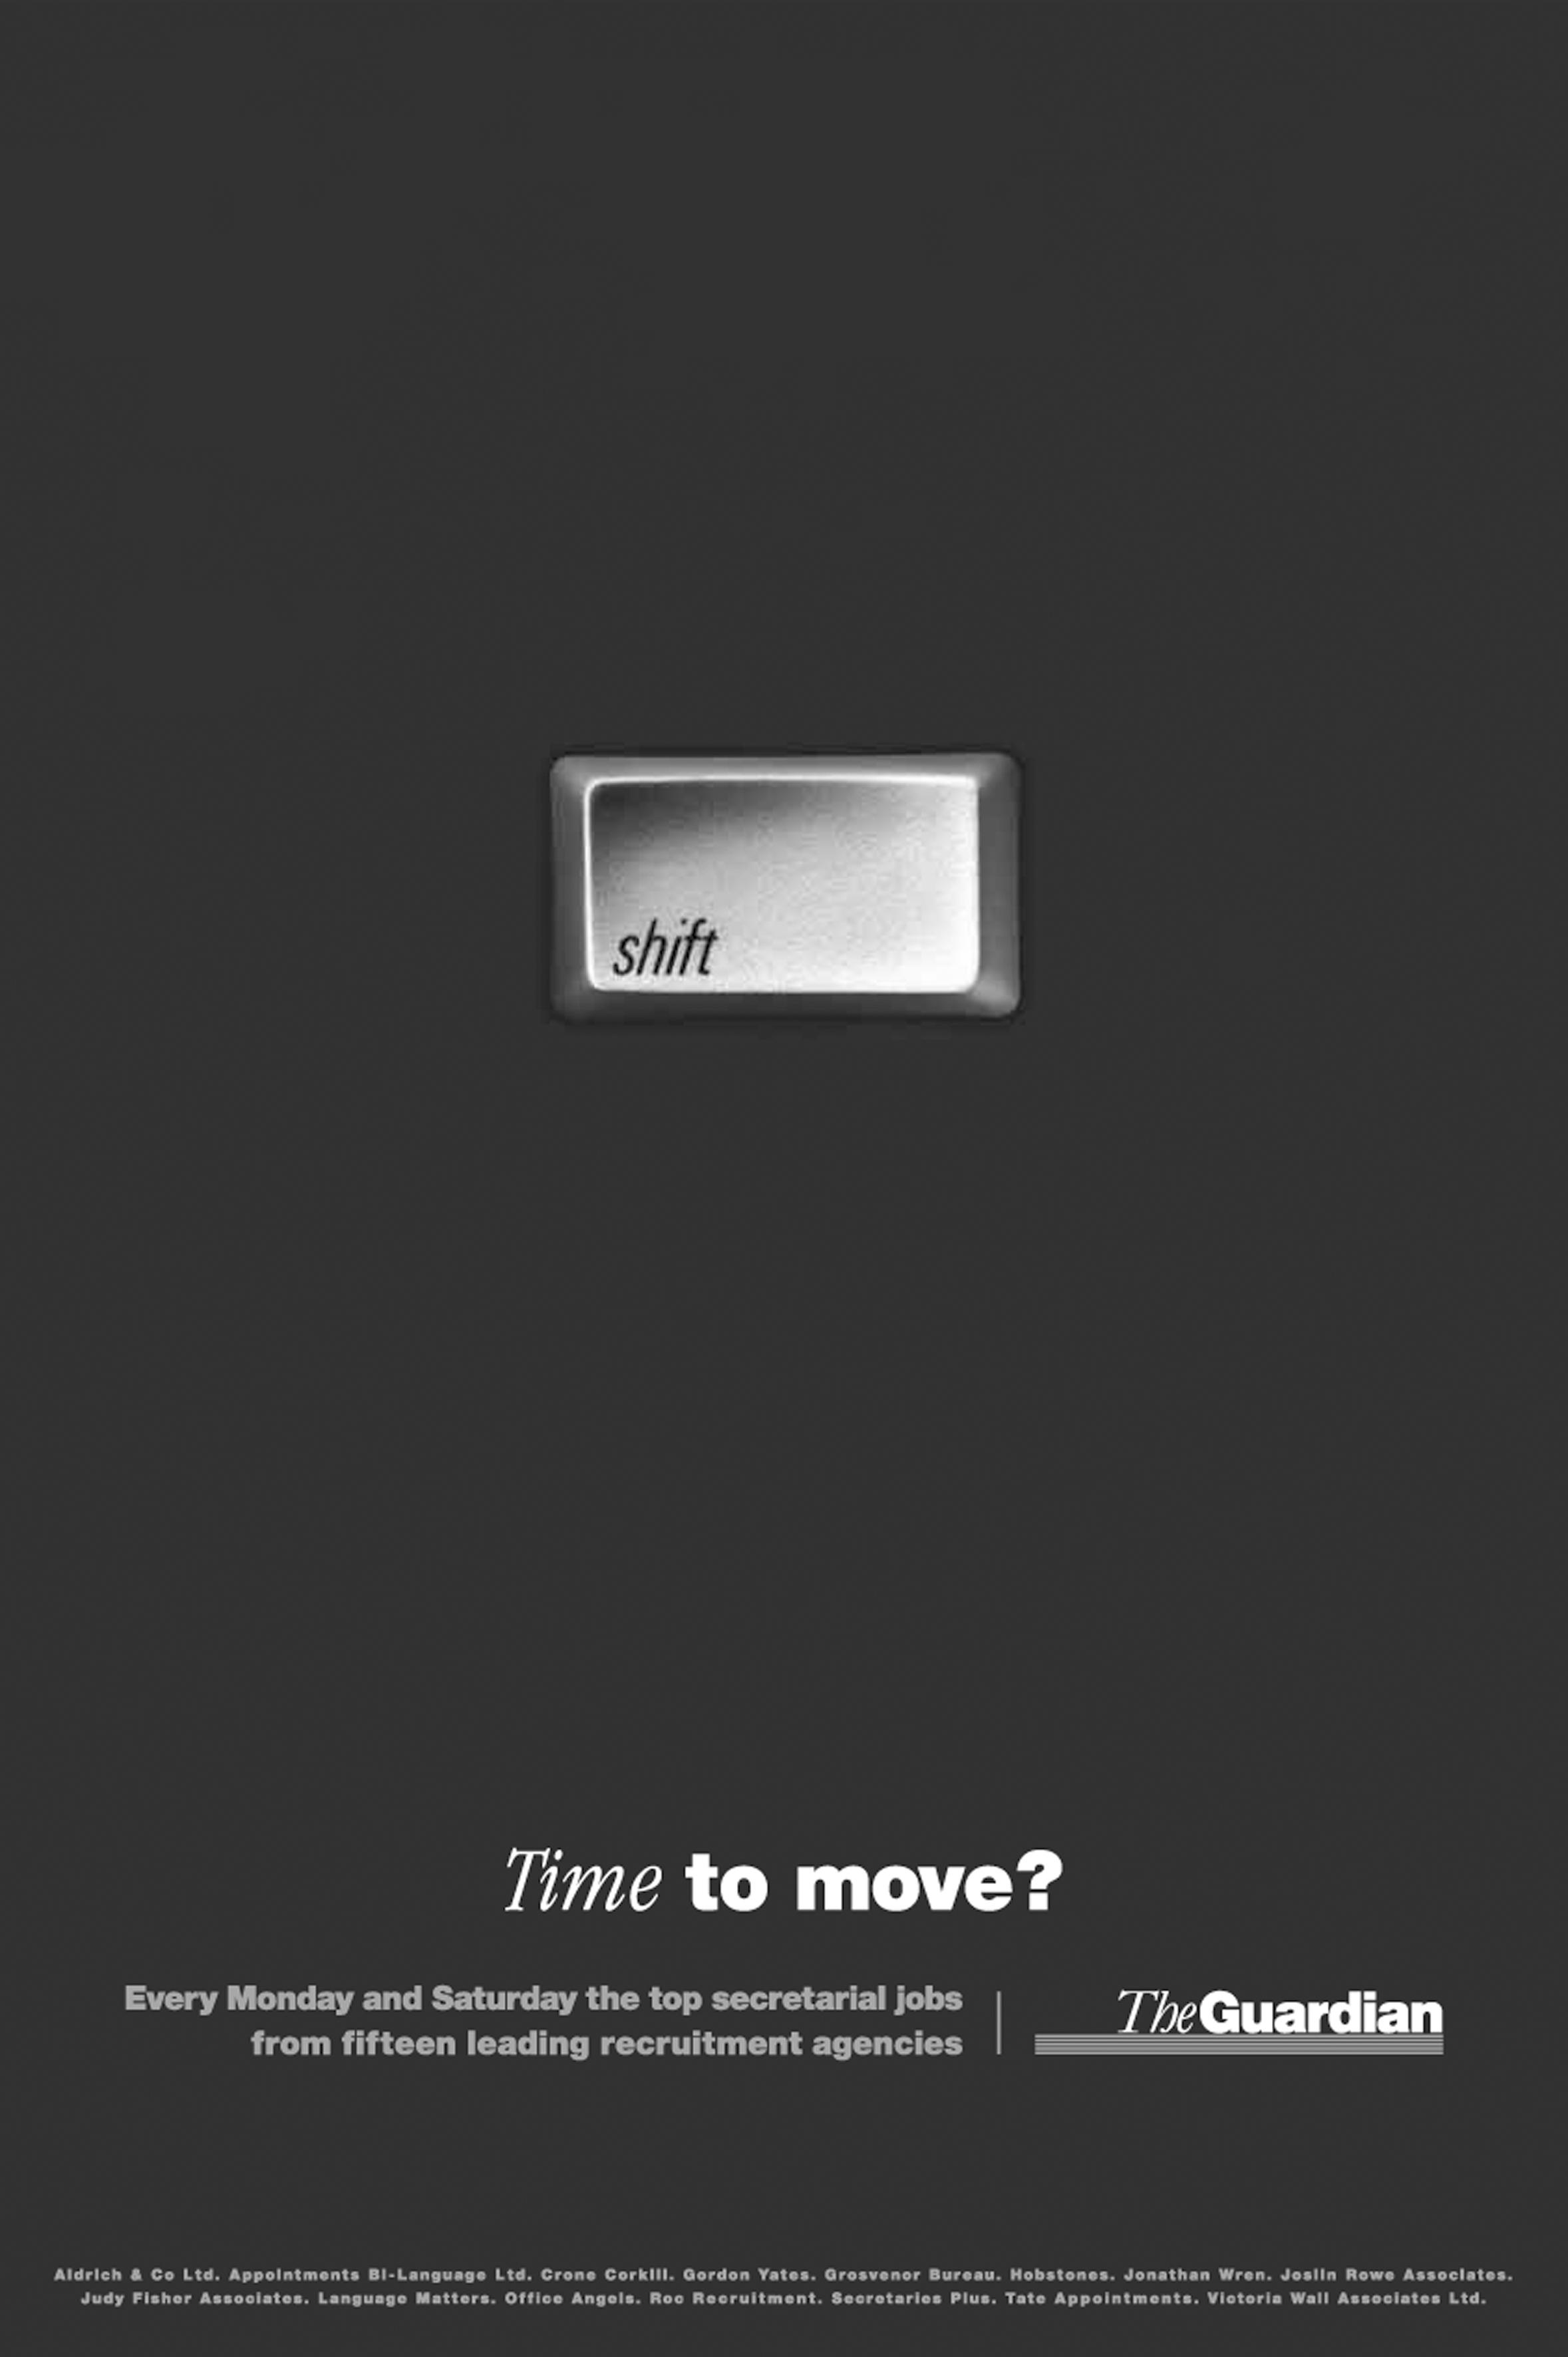 'Time To Move' The Guardian, Tony Davidson.jpg